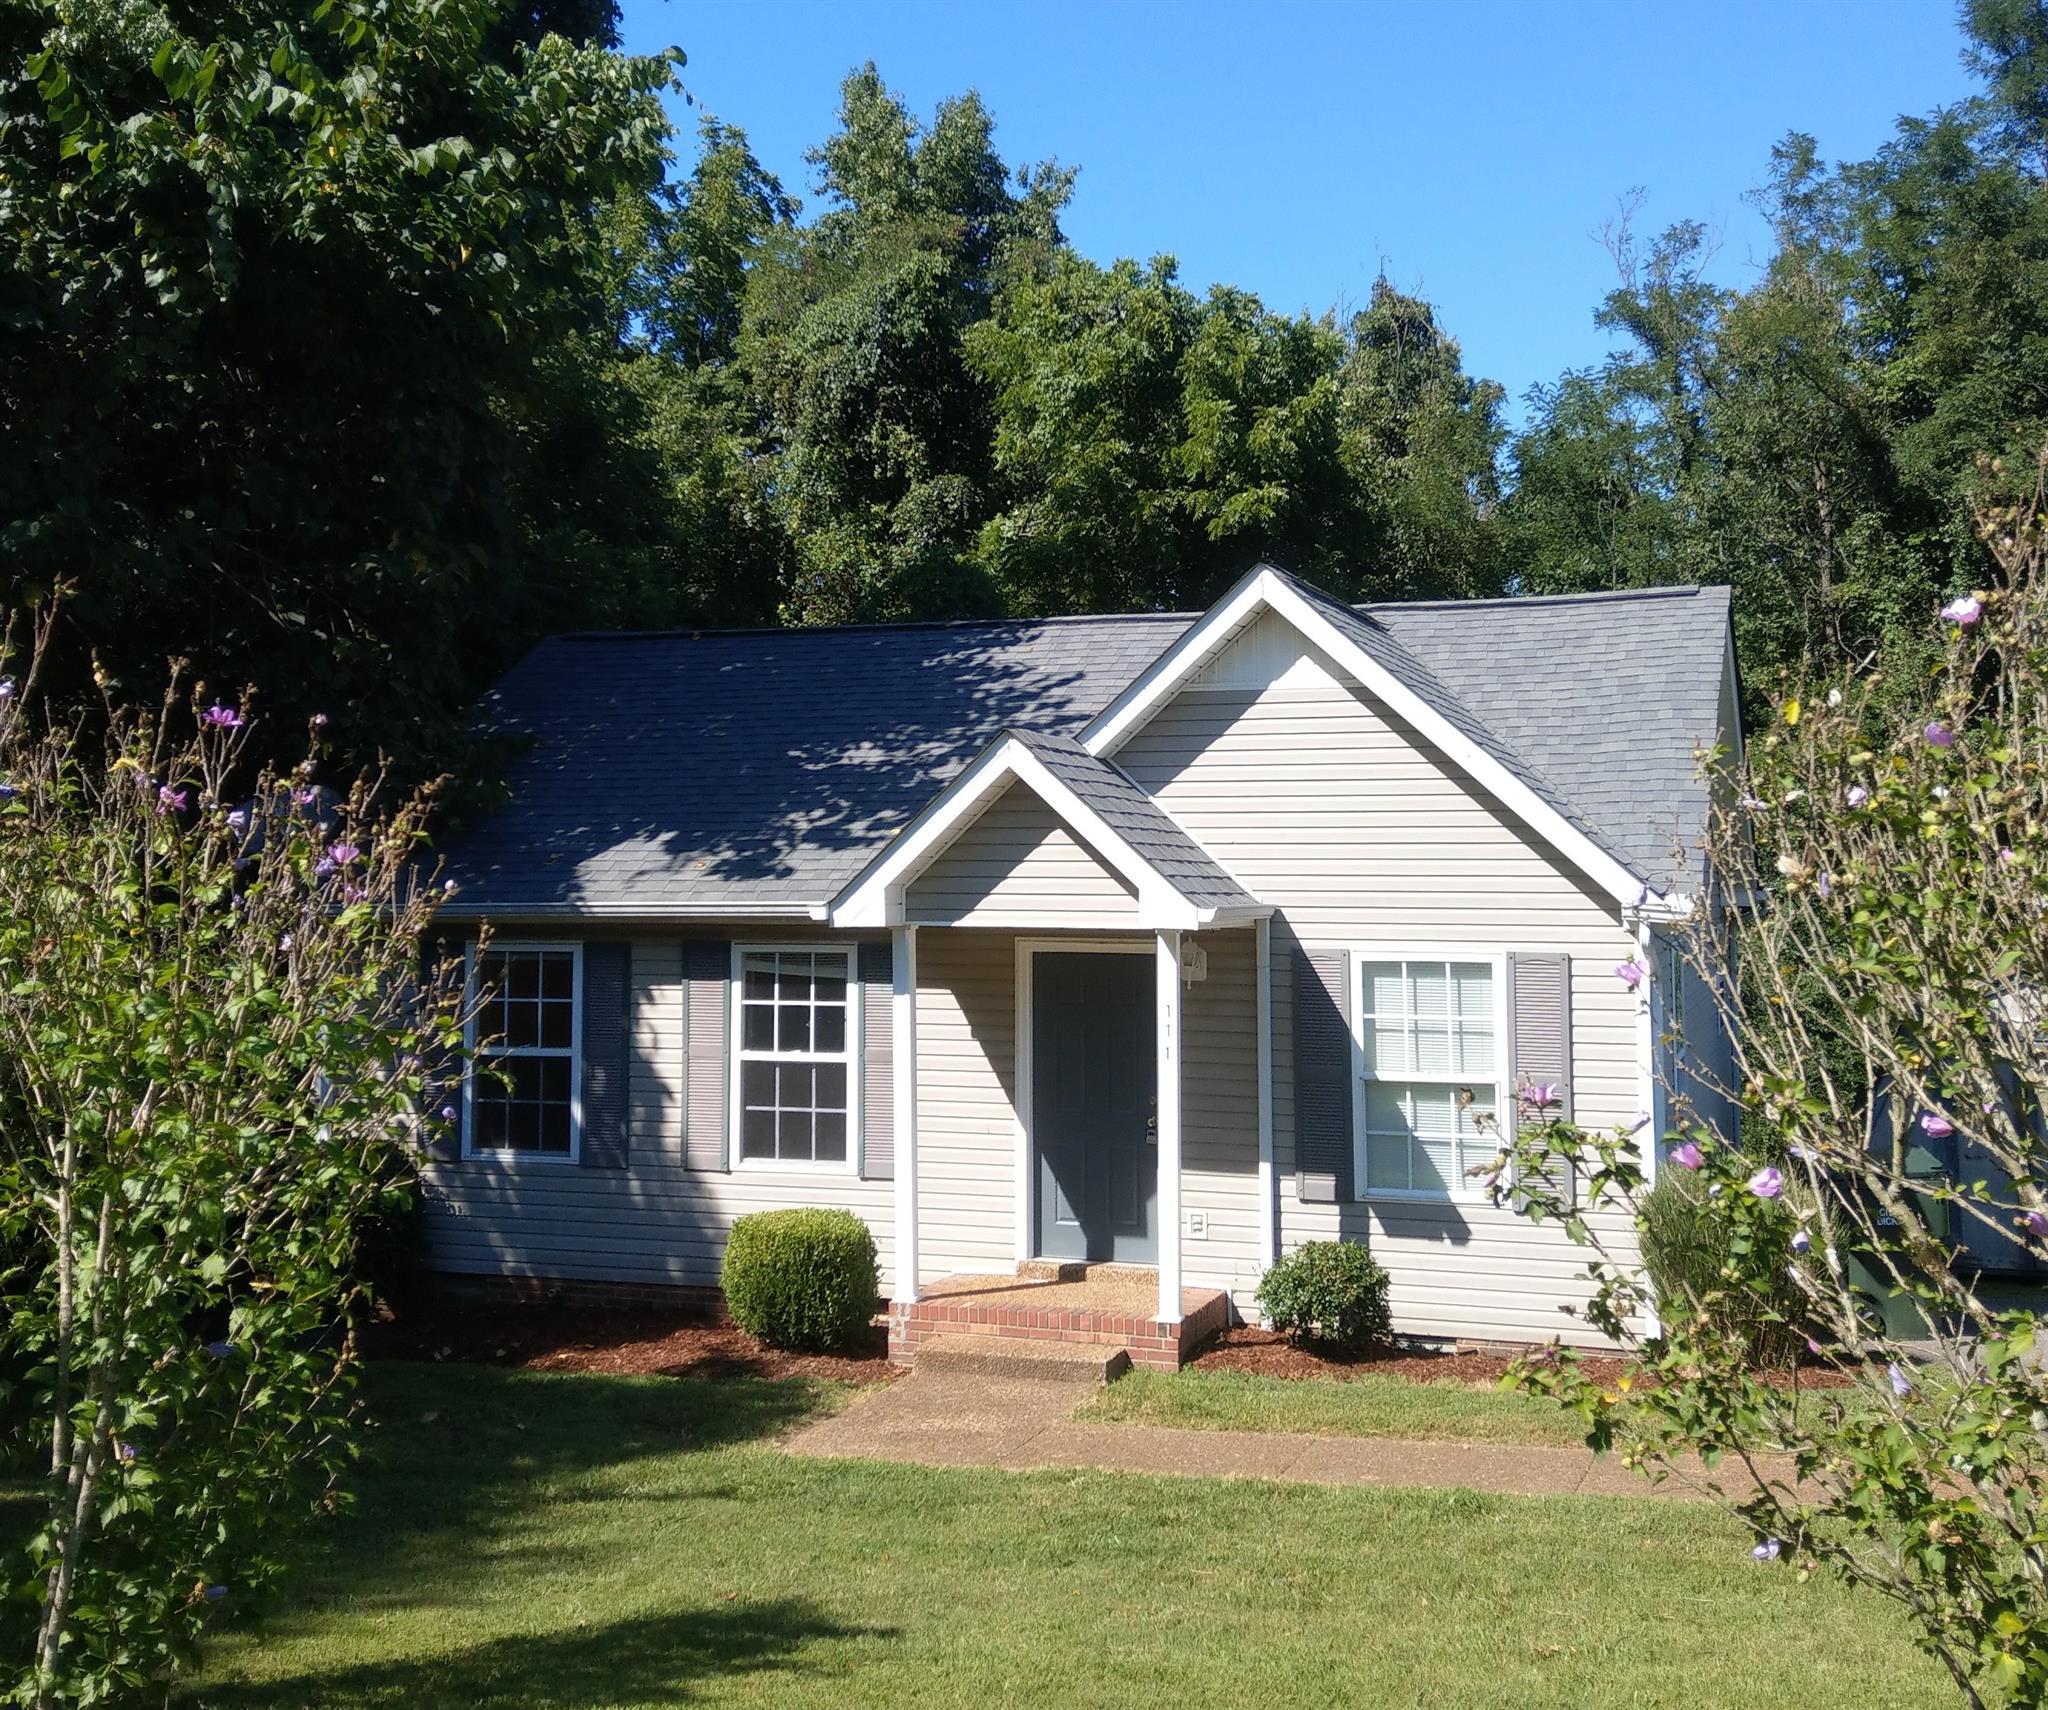 111 Batey Cir, Dickson, TN 37055 - Dickson, TN real estate listing